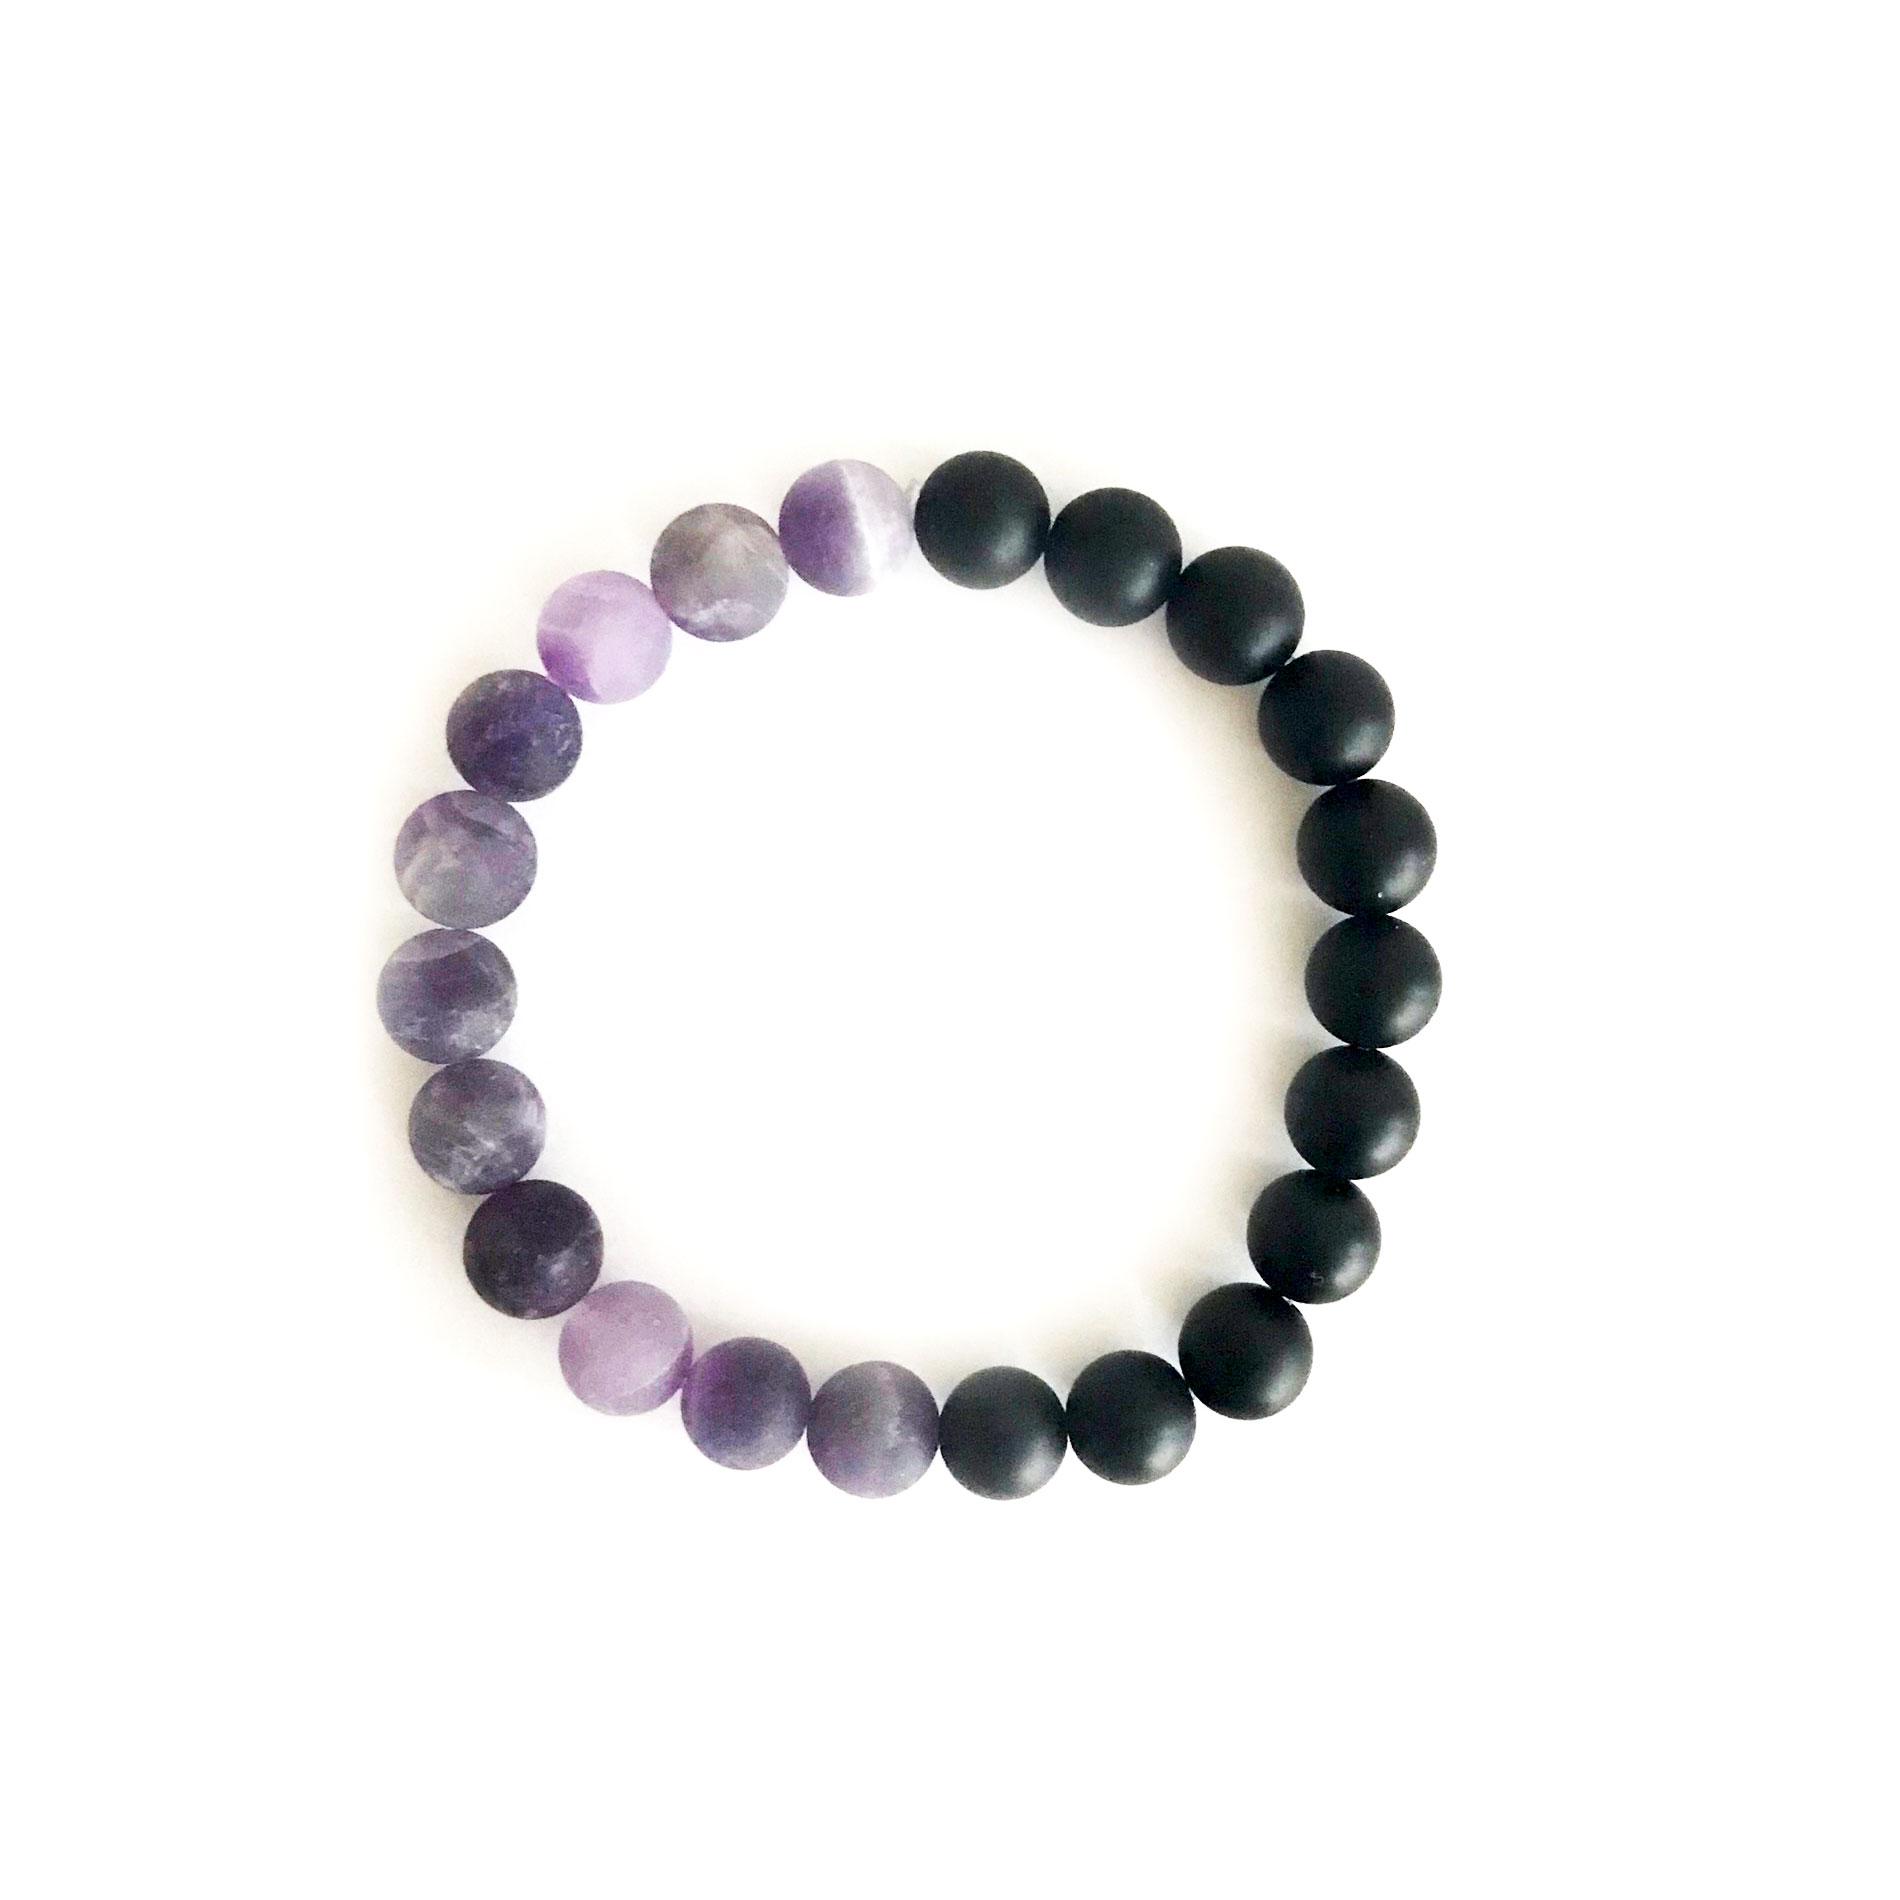 Amethyst /& Onyx Beaded Bracelet